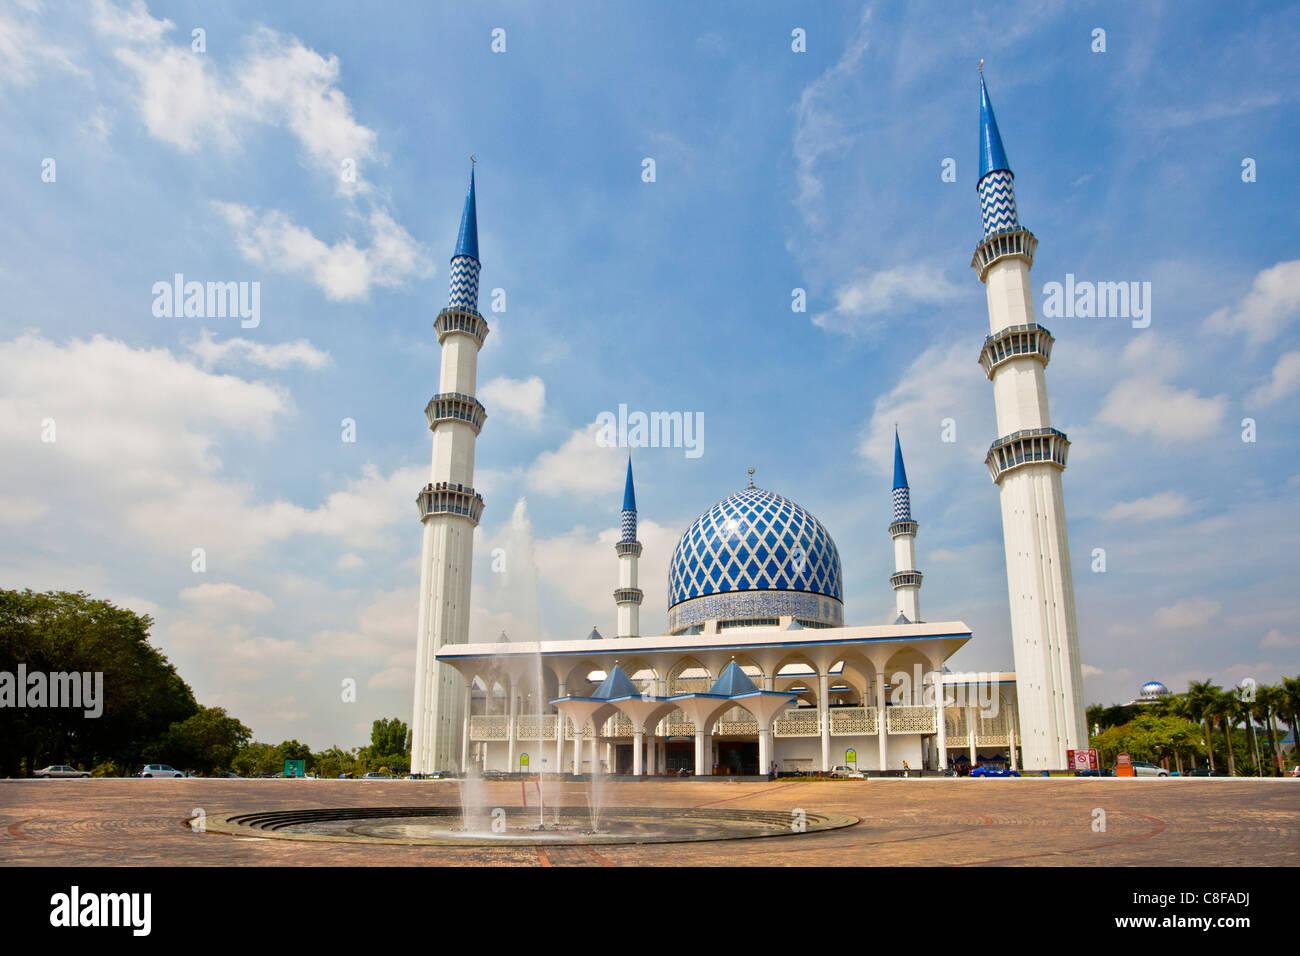 Malaysia, Asia, Selangor, Sha Alam, city, national mosque, mosque, The Blue Mosque, sultan Abdul Aziz Mosque, blue - Stock Image